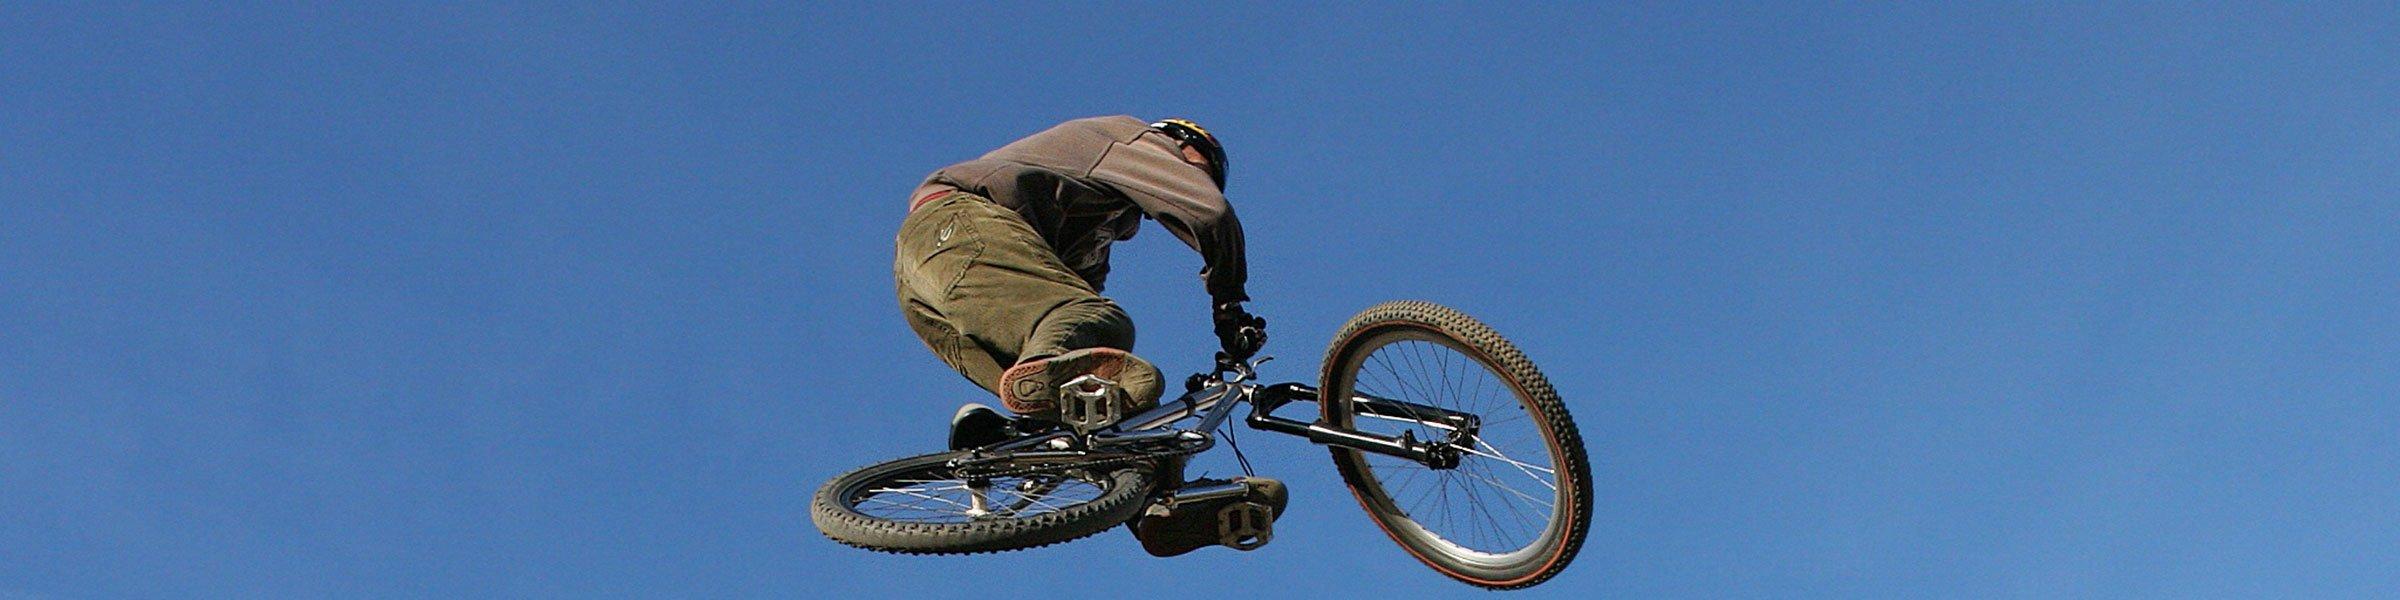 Eugene Mountain Bike Suspension Setup